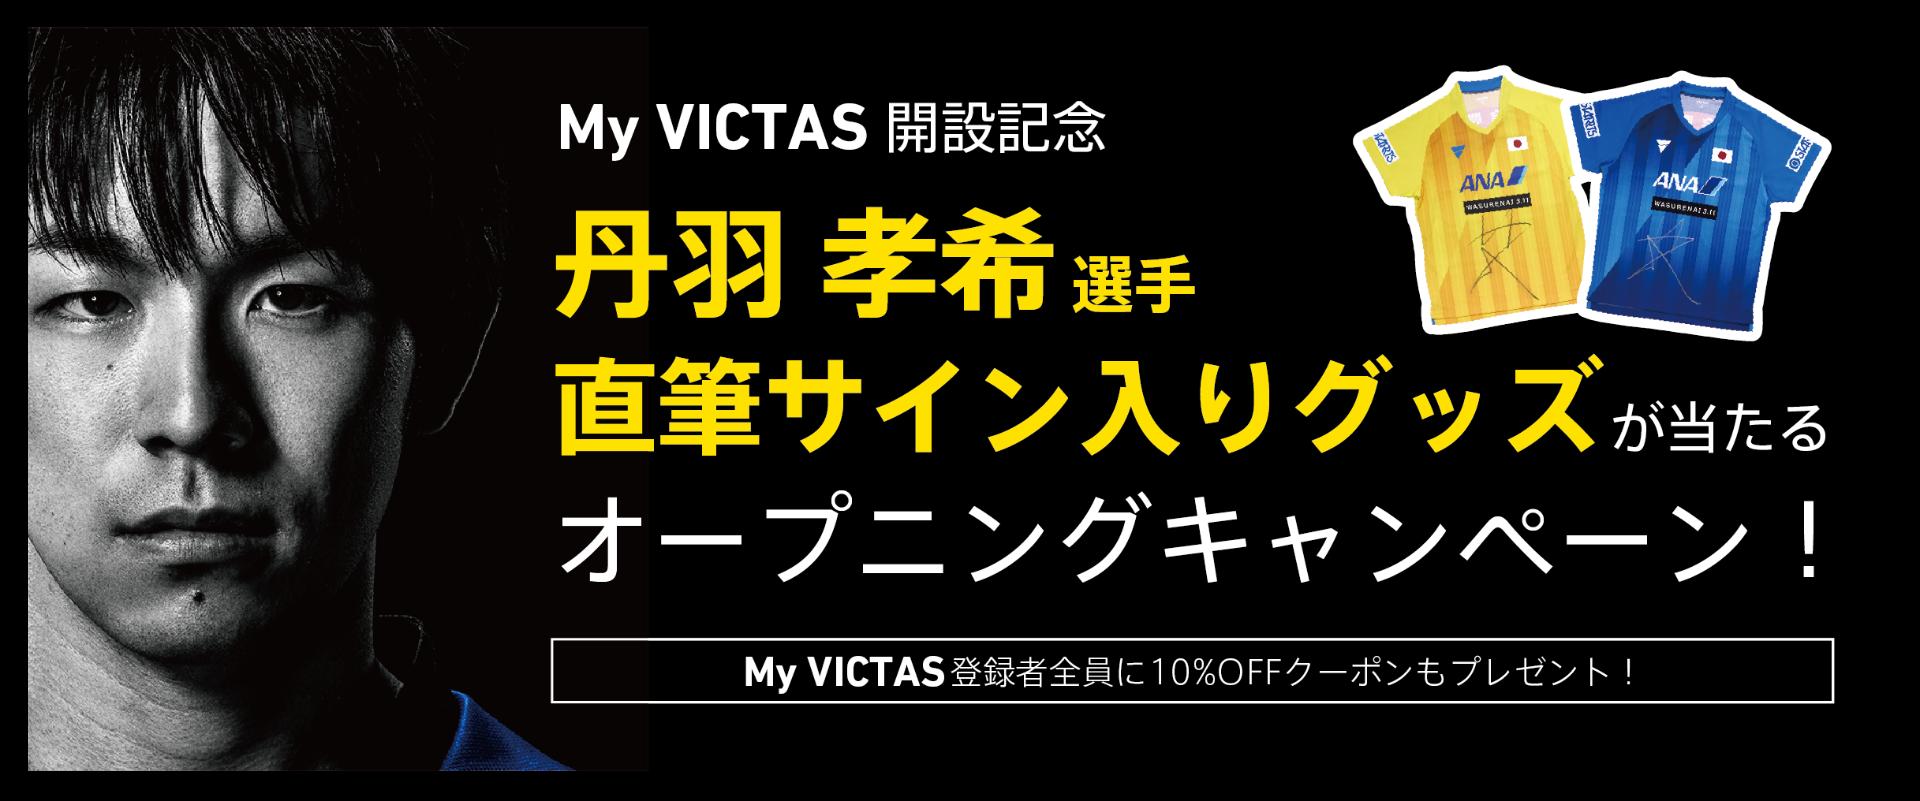 My VICTAS 開設記念 丹羽孝希選手直筆サイン入りグッズが当たる!オープニングキャンペーン